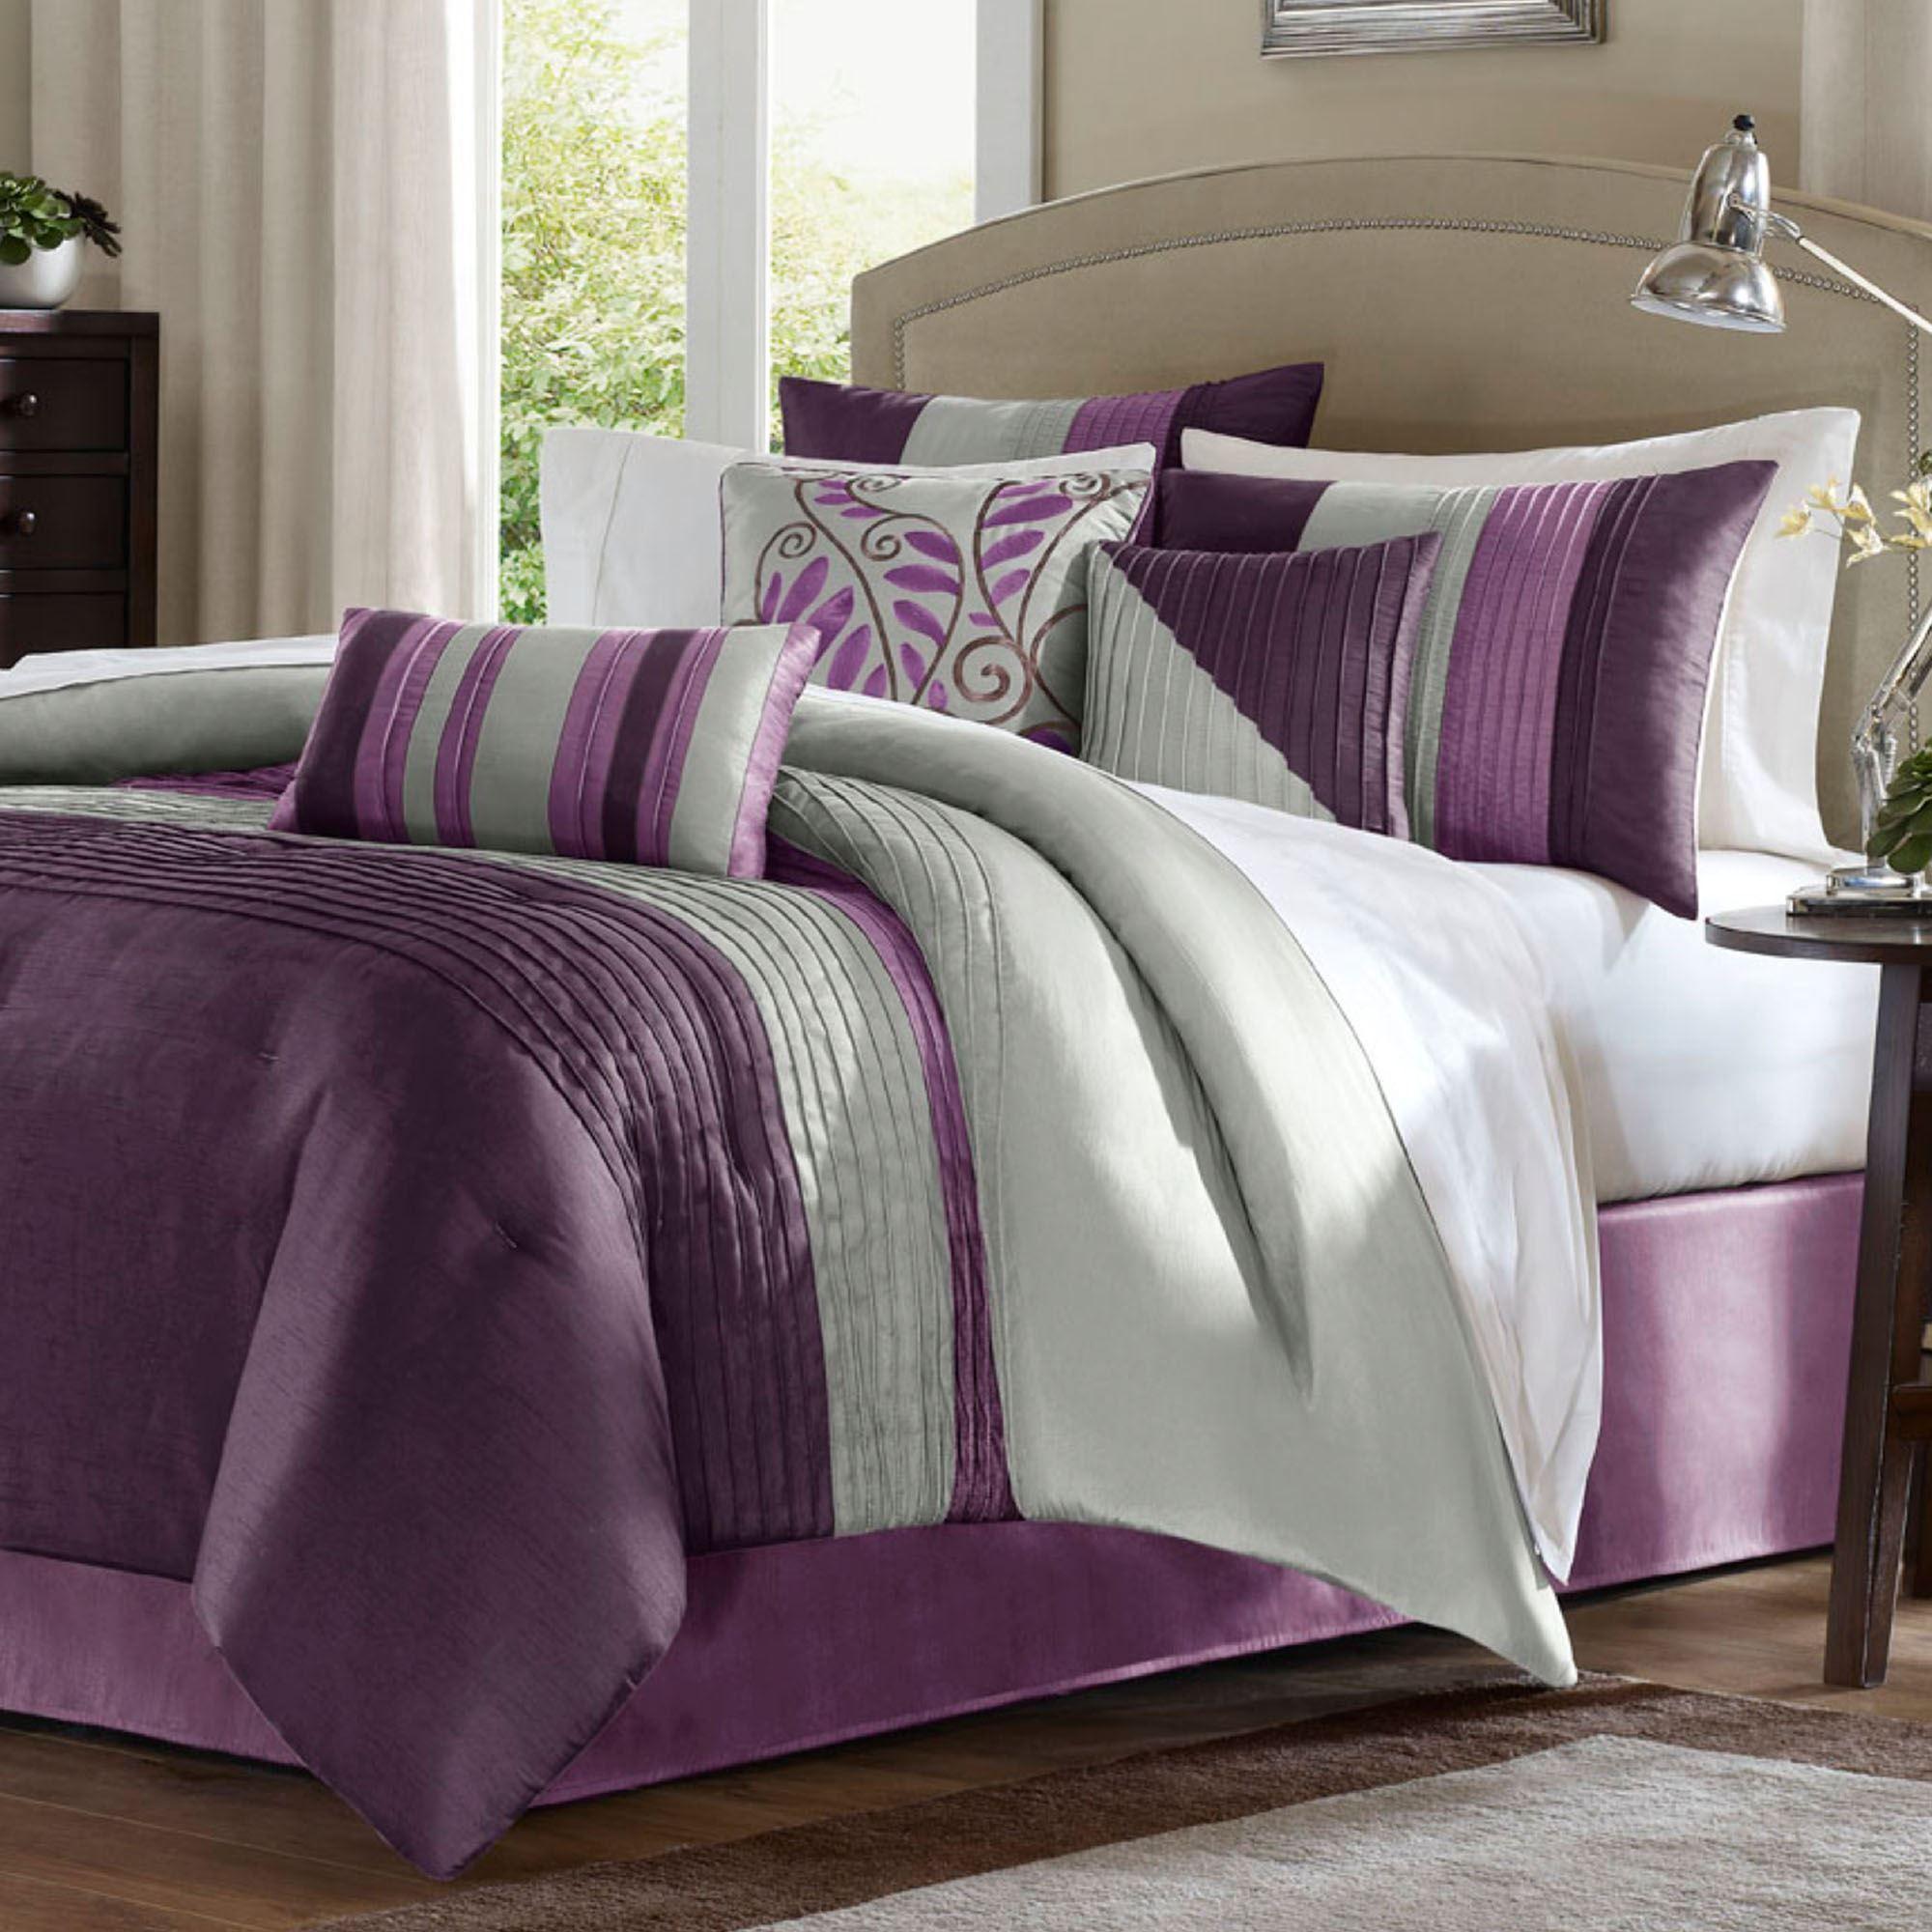 bed pintuck set comforters size free p shipping king salem pc comforter